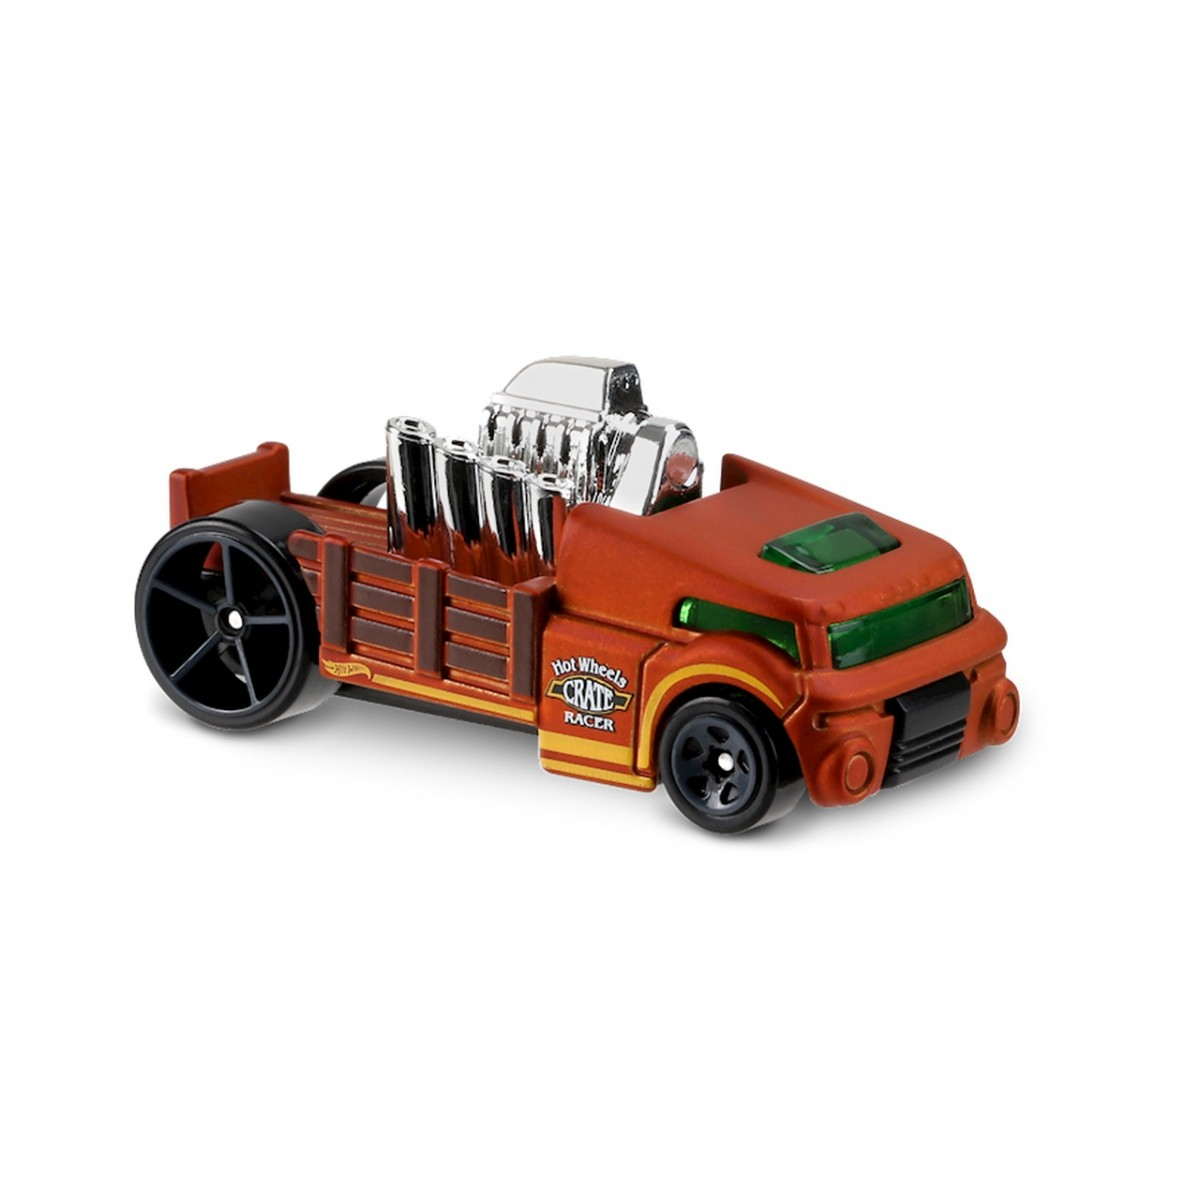 Carrinho Hot Wheels: Crate Racer Marrom